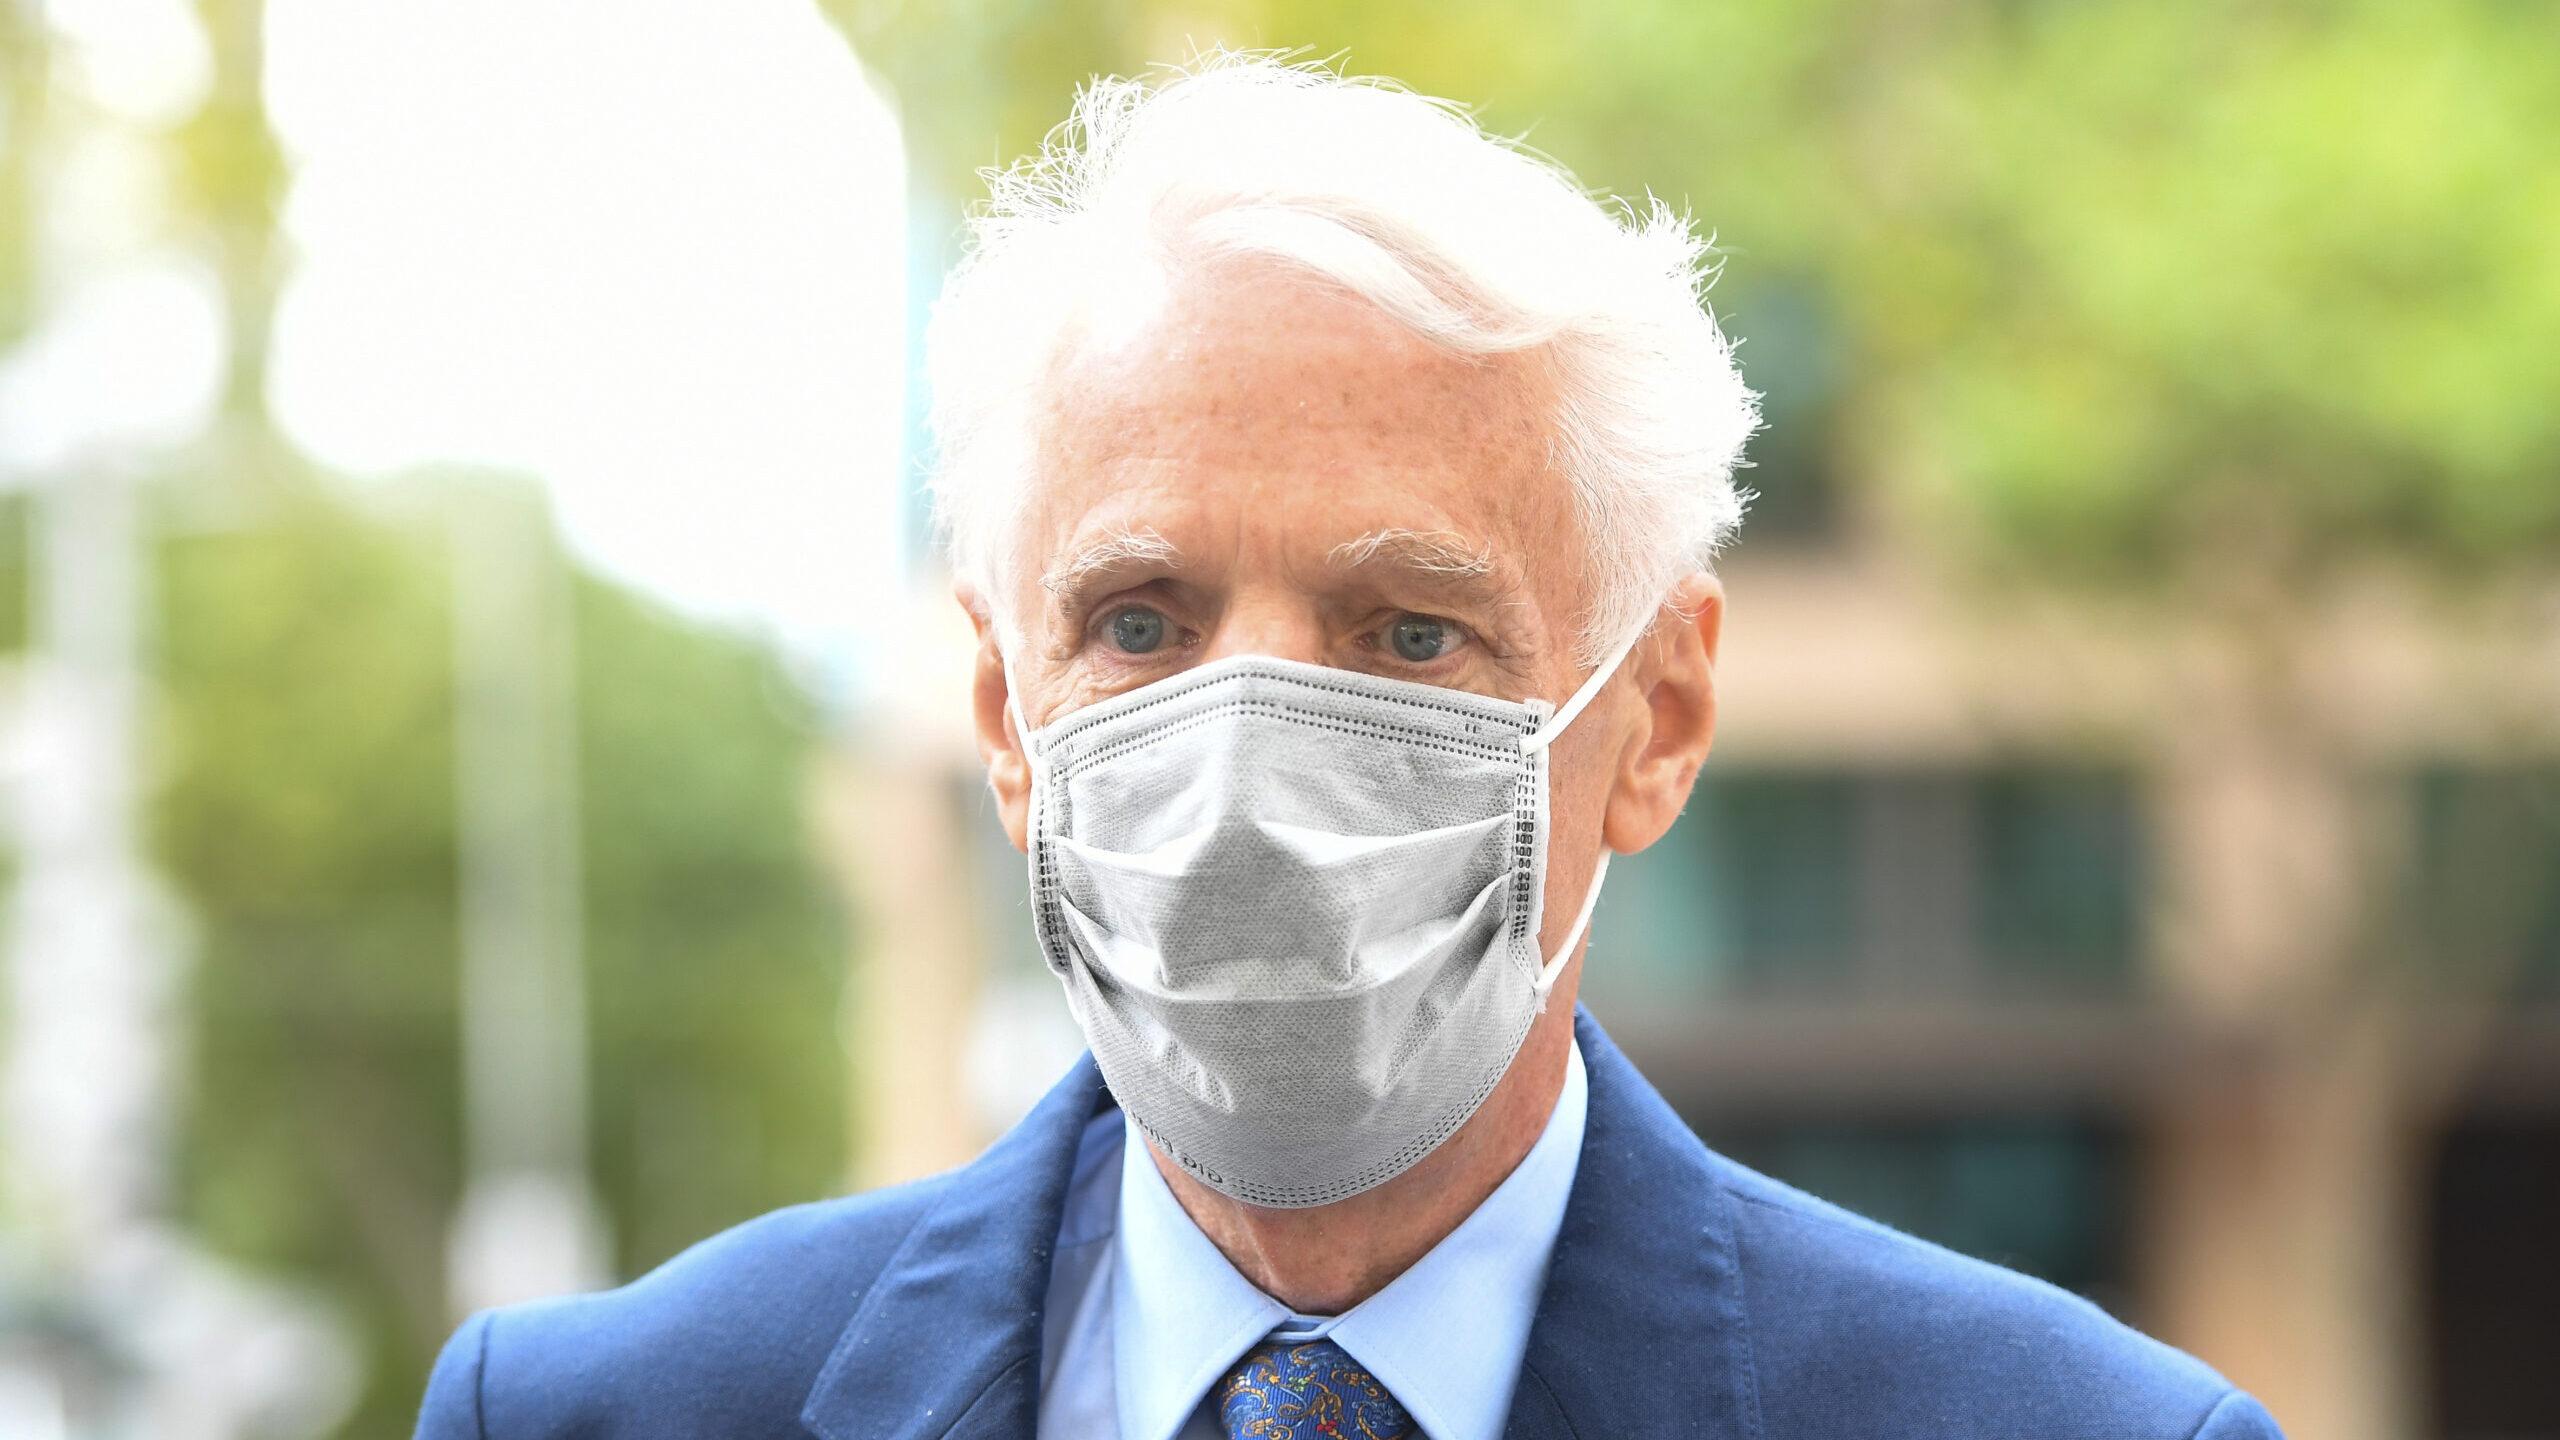 Australian Headmaster Who Faked His CV Spared Jail